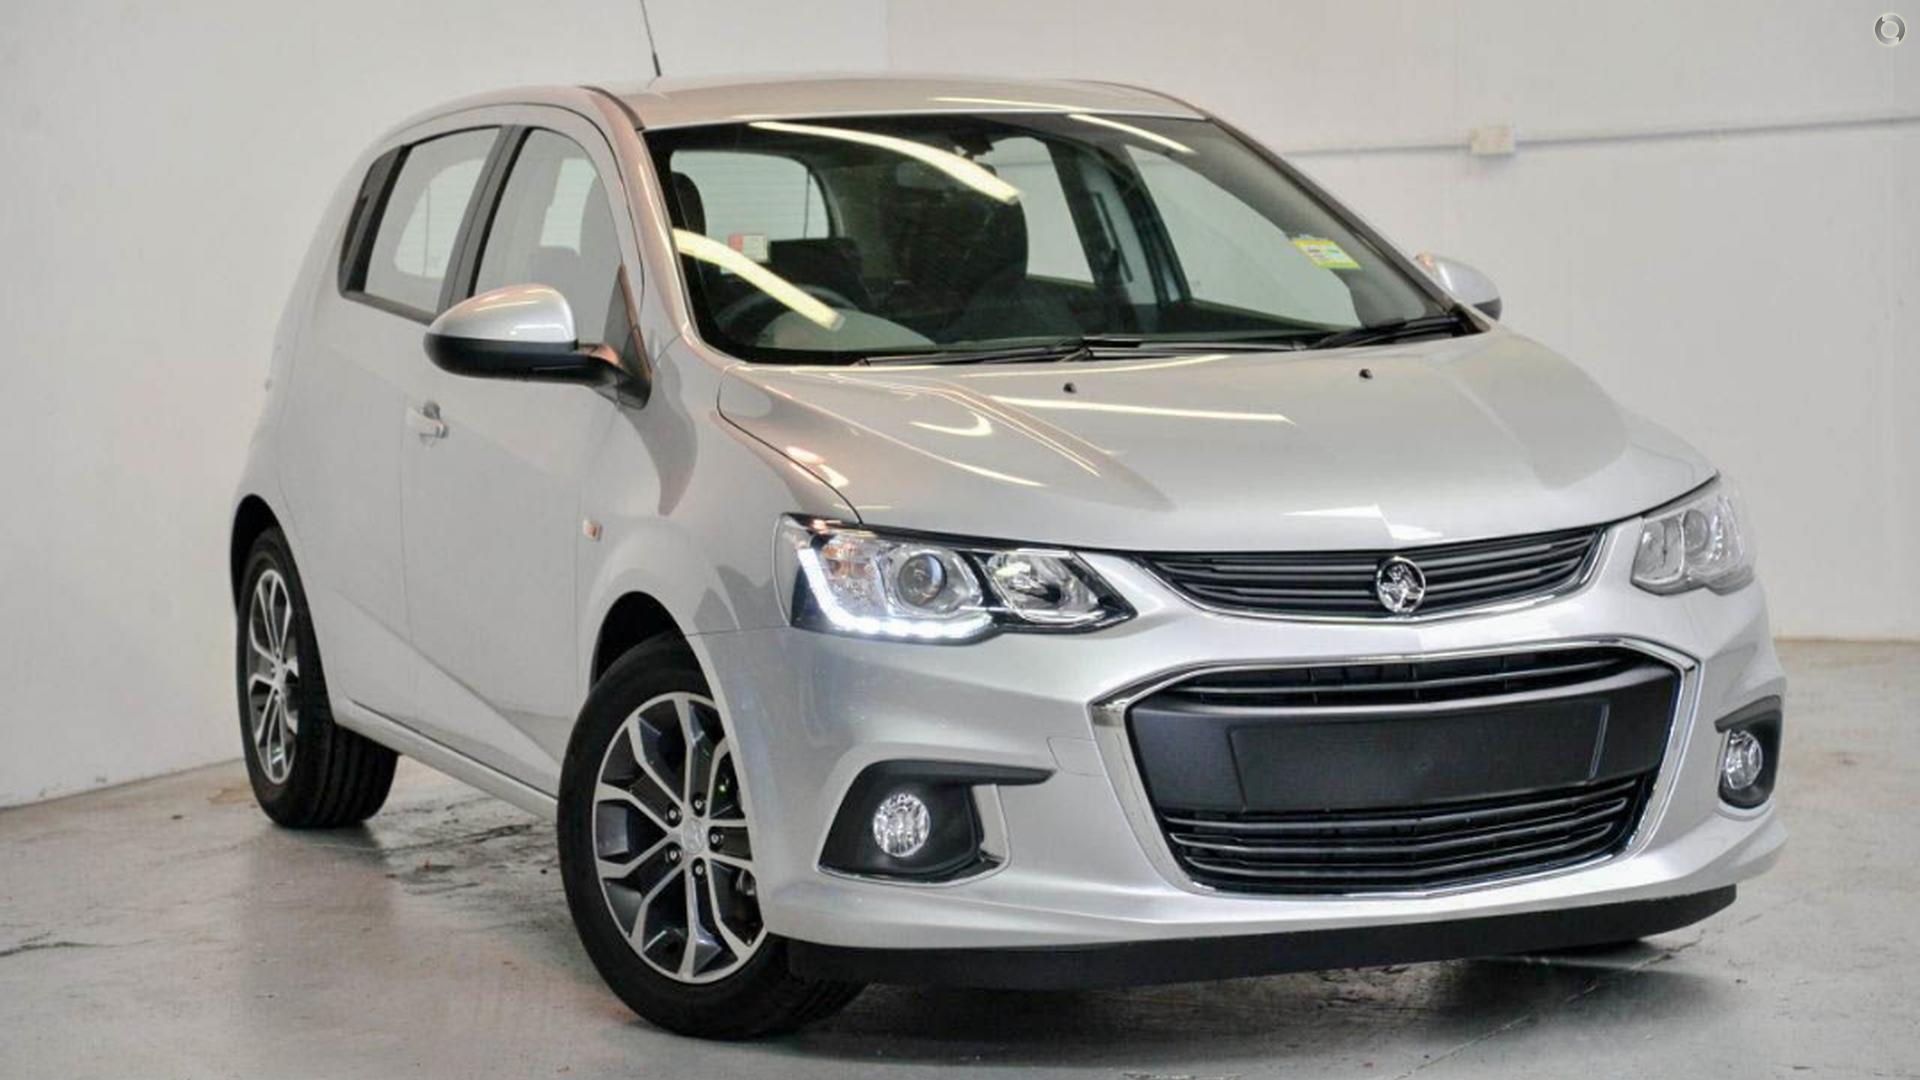 2018 Holden Barina Ls